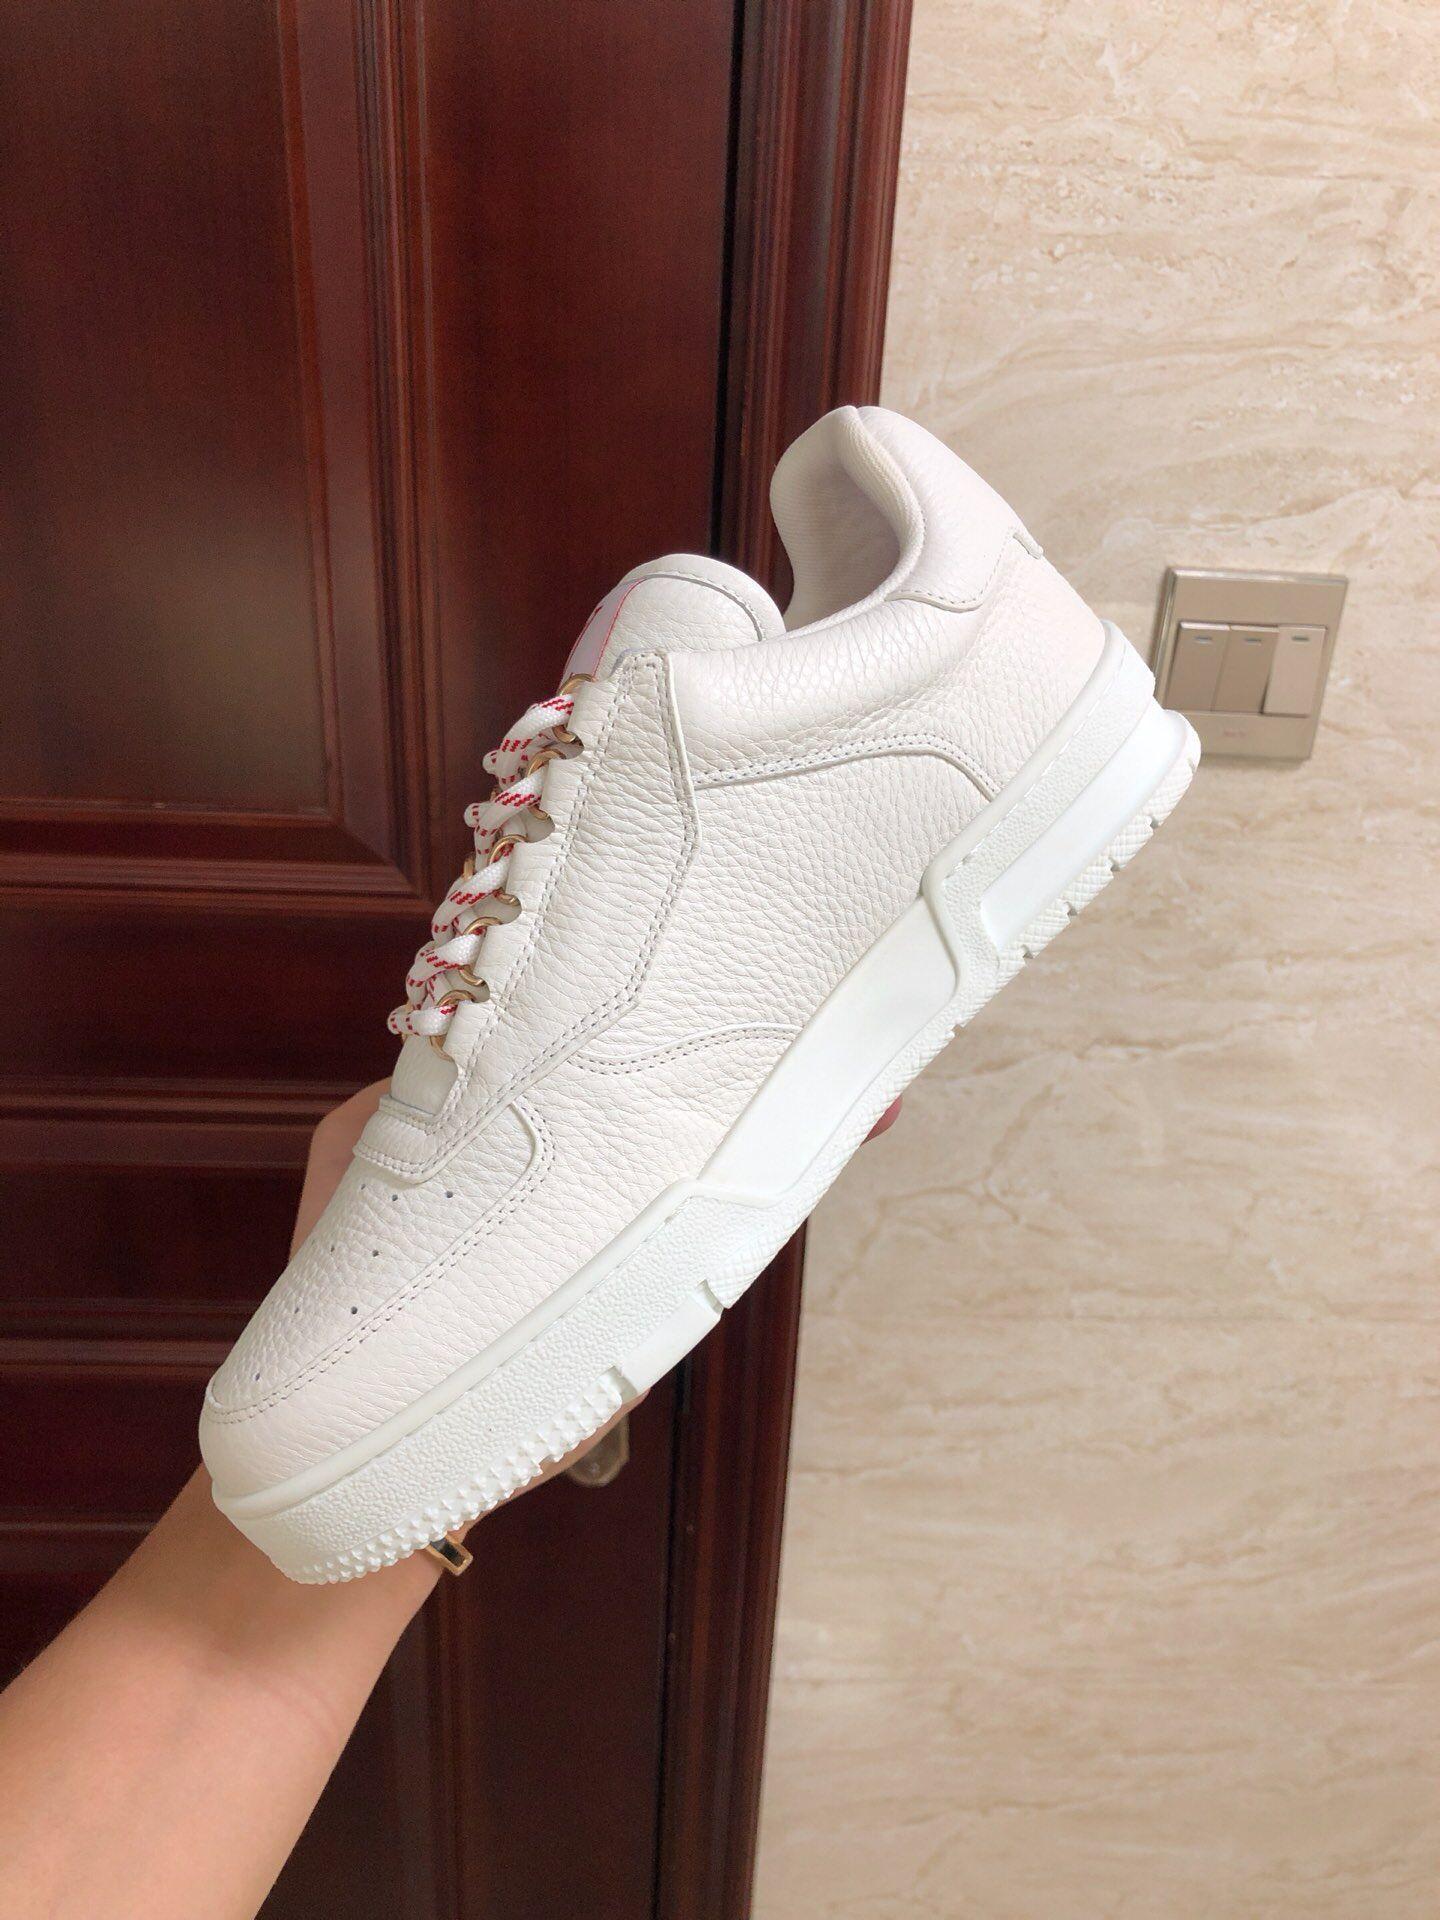 lv trainer sneaker lv  vintage basketball sneaker lv shoes 1A5EN0 6